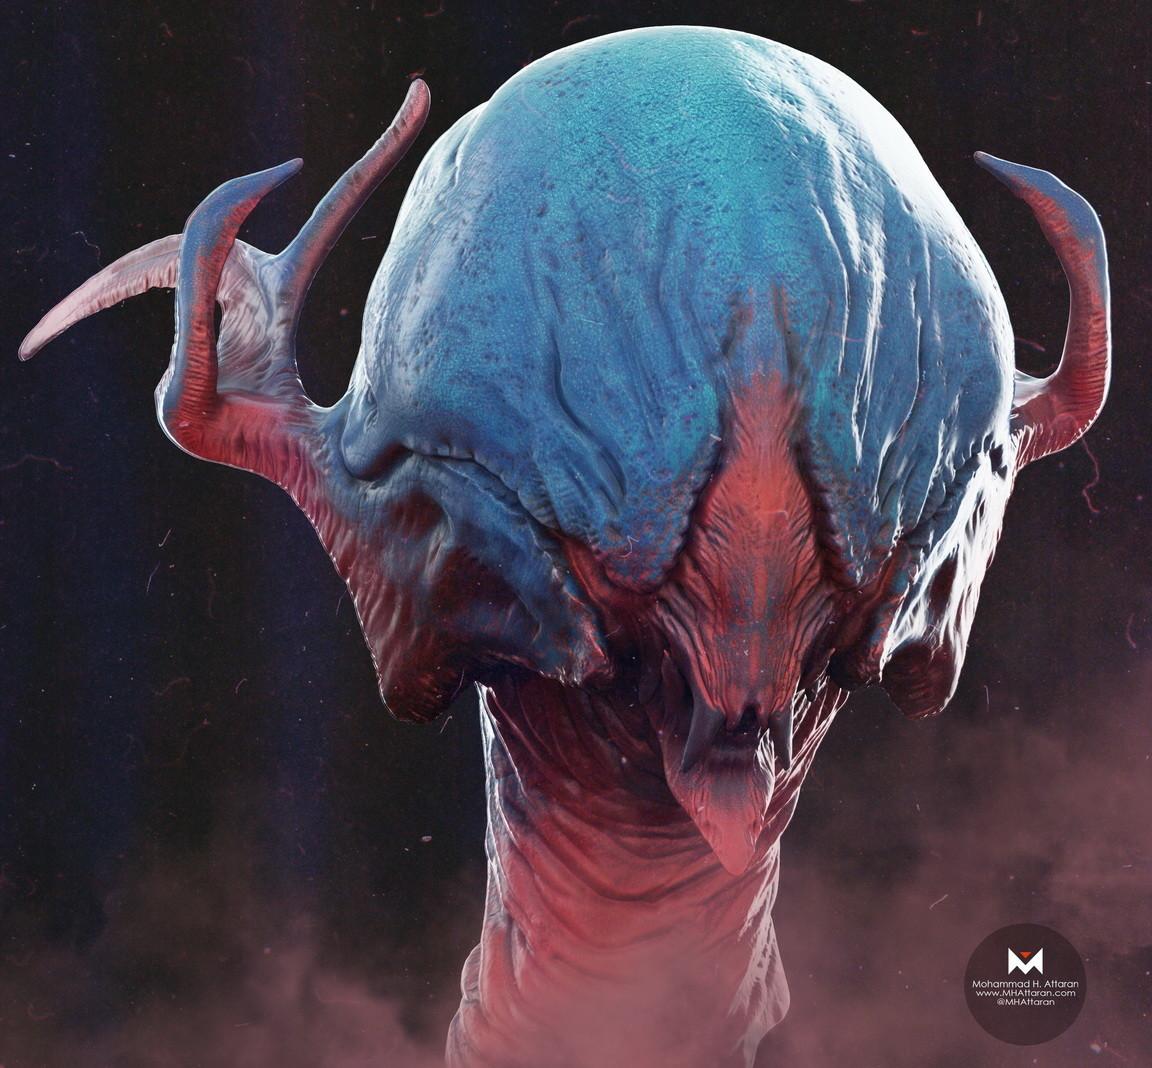 Mohammx hossein attaran creature02 02